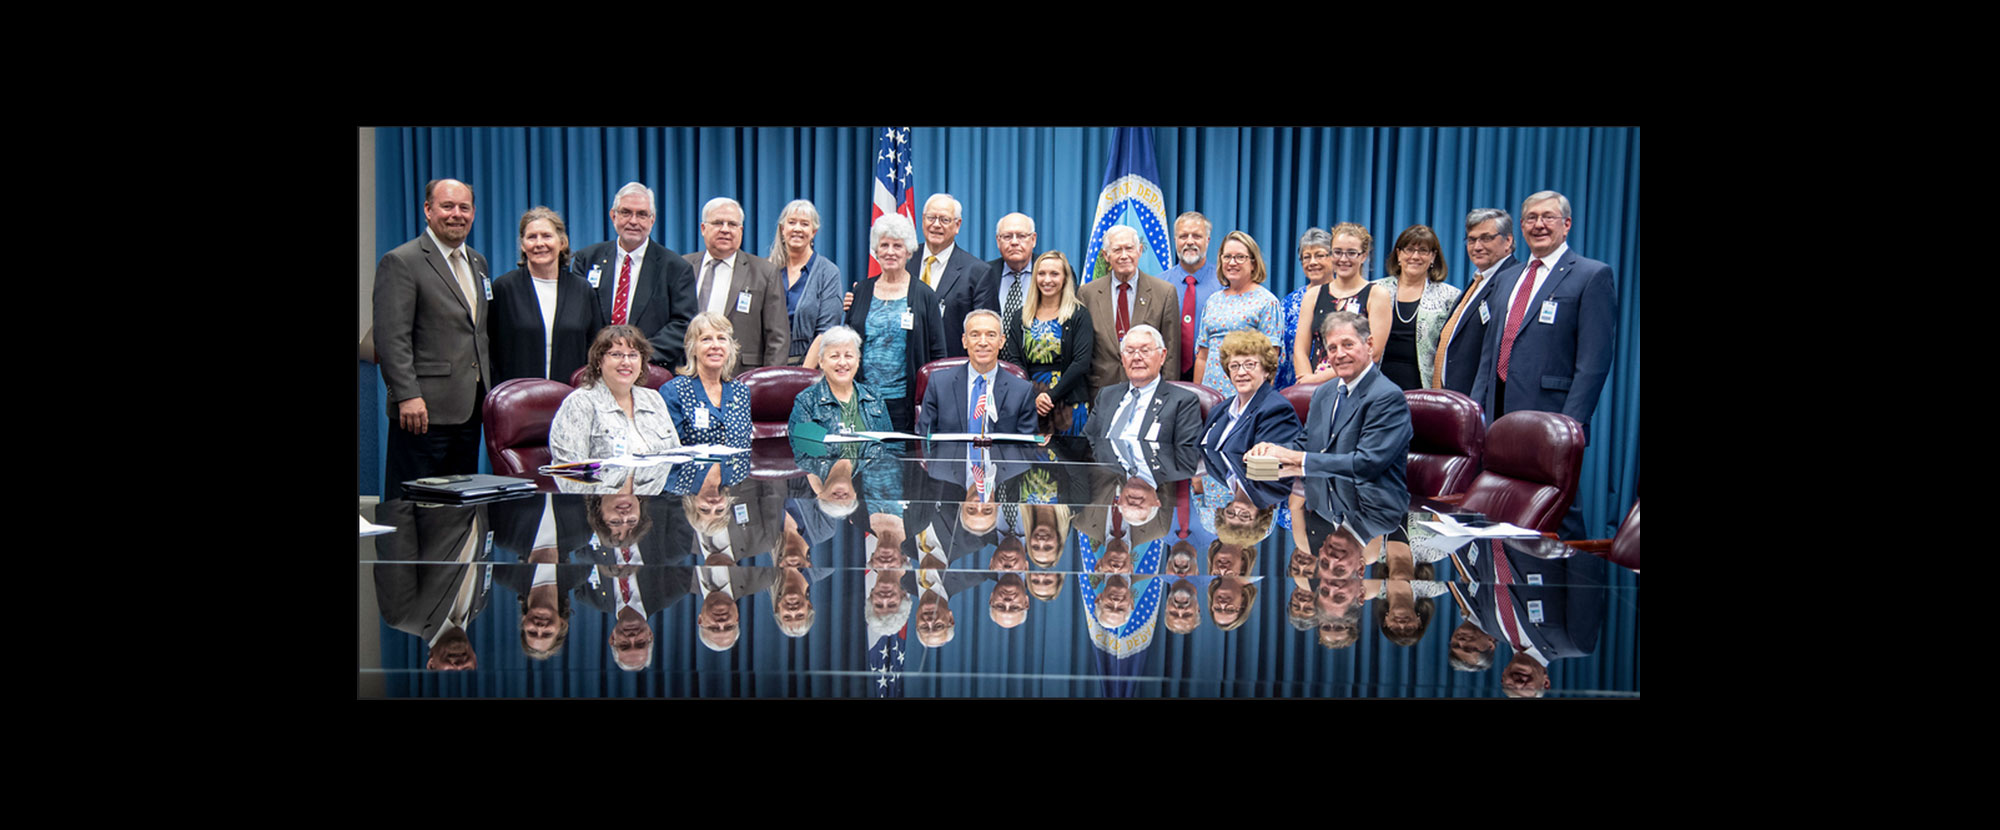 USDA and IFYE hold Ceremony to Sign Memorandum